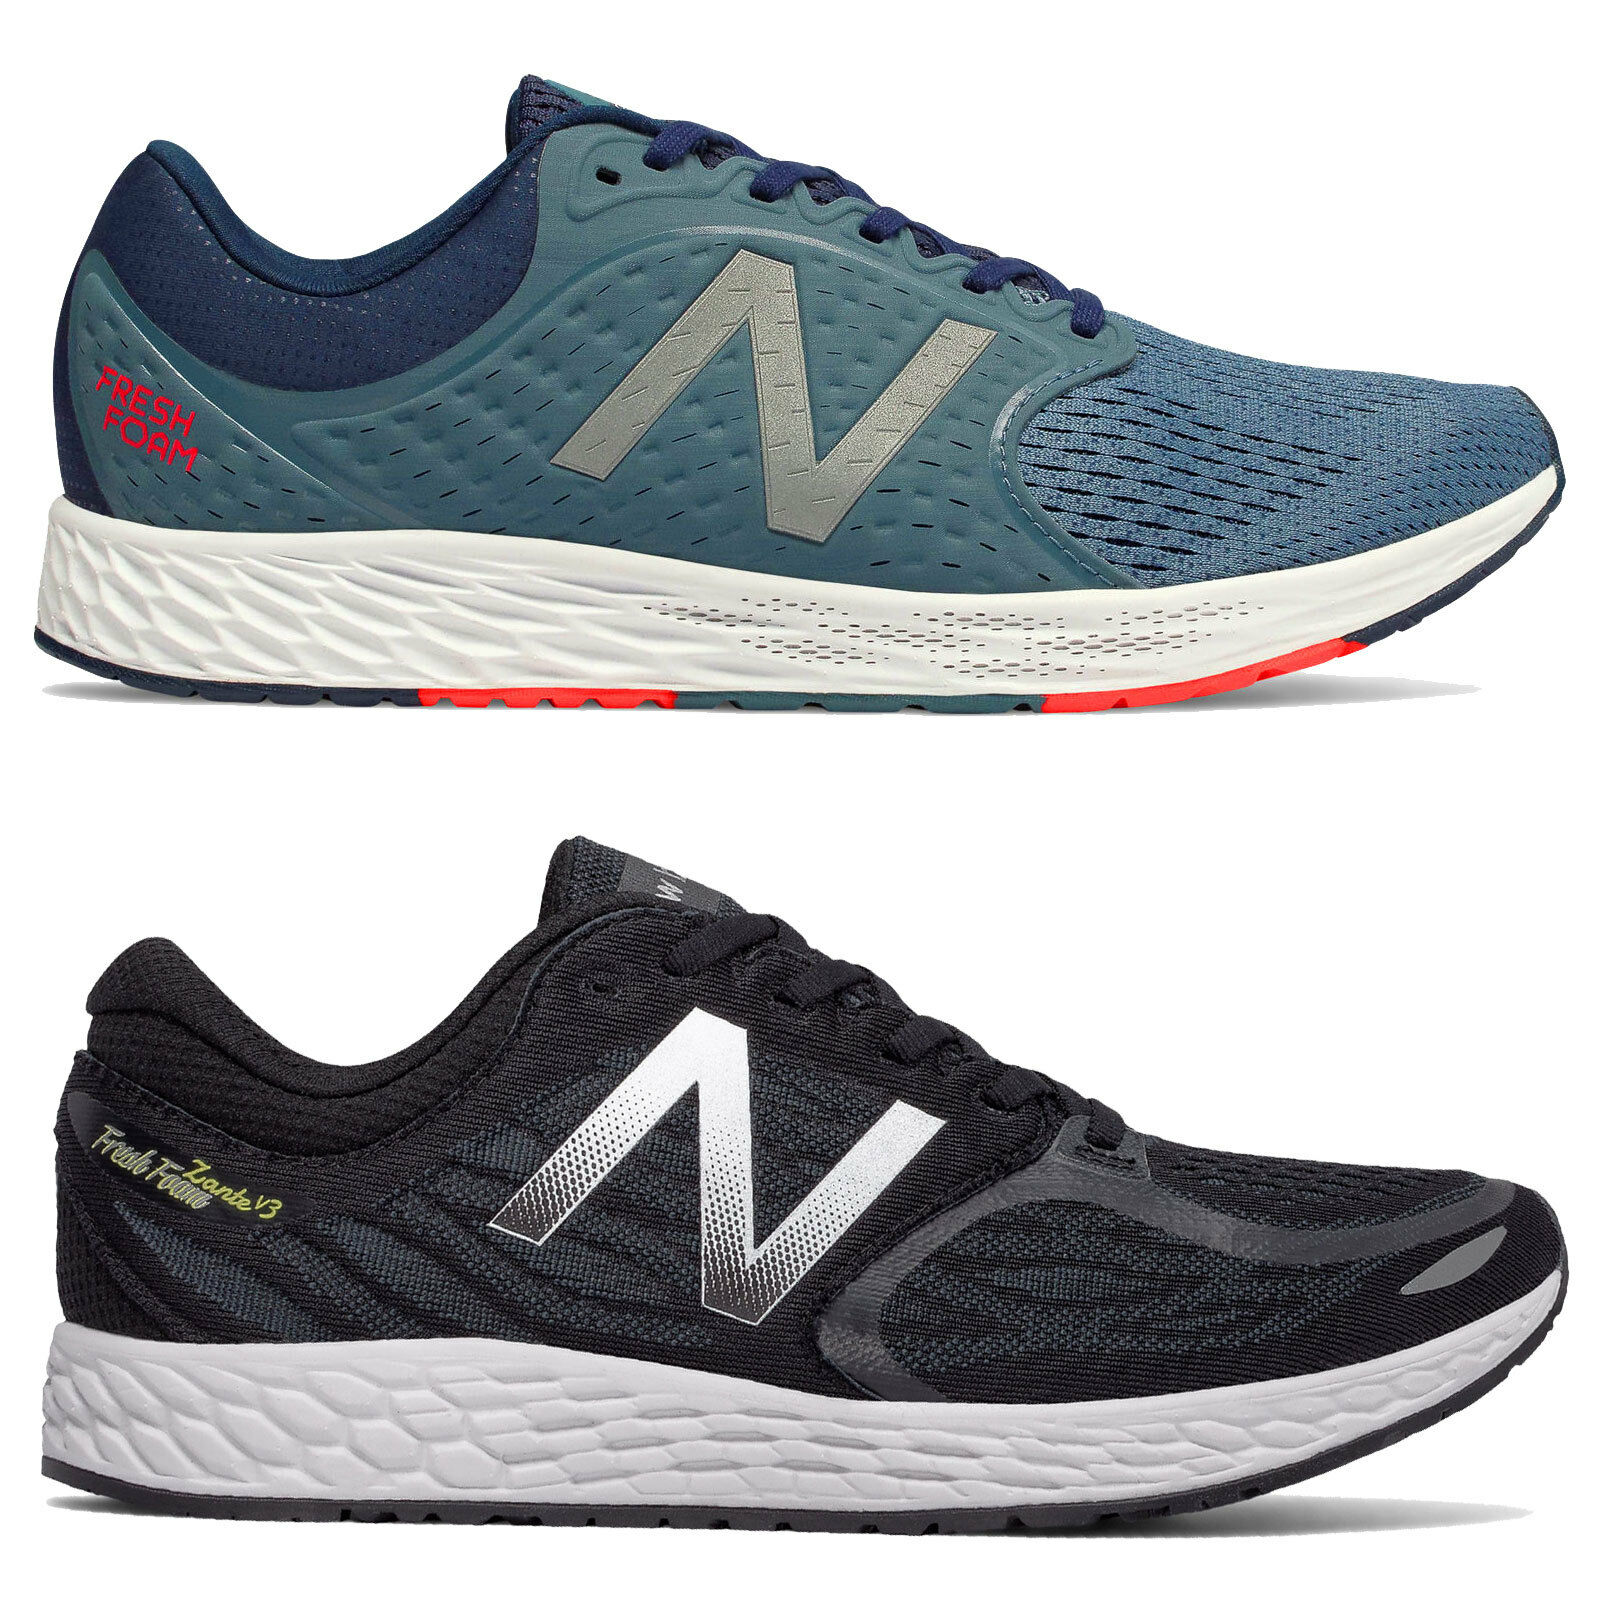 New Balance Fresh Foam Zante v3 Men's Running shoes Training shoes Trainers